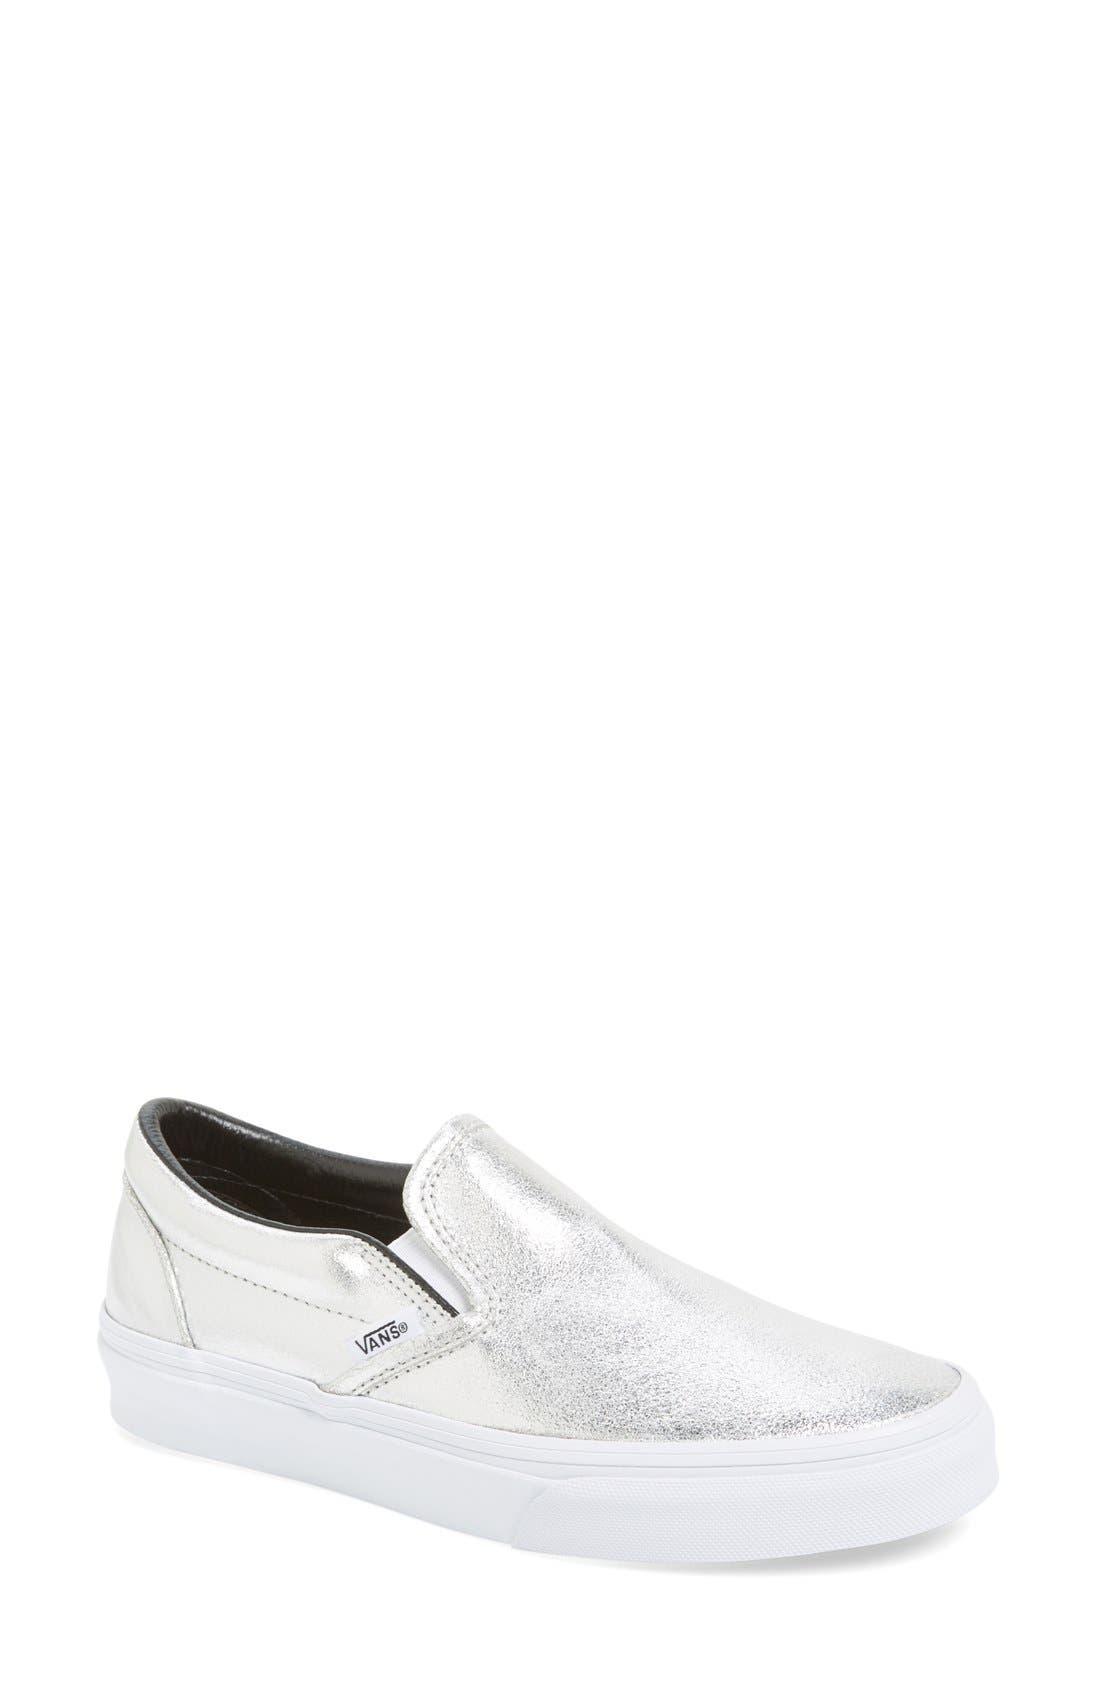 Main Image - Vans Metallic Leather Slip-On Sneaker (Women)